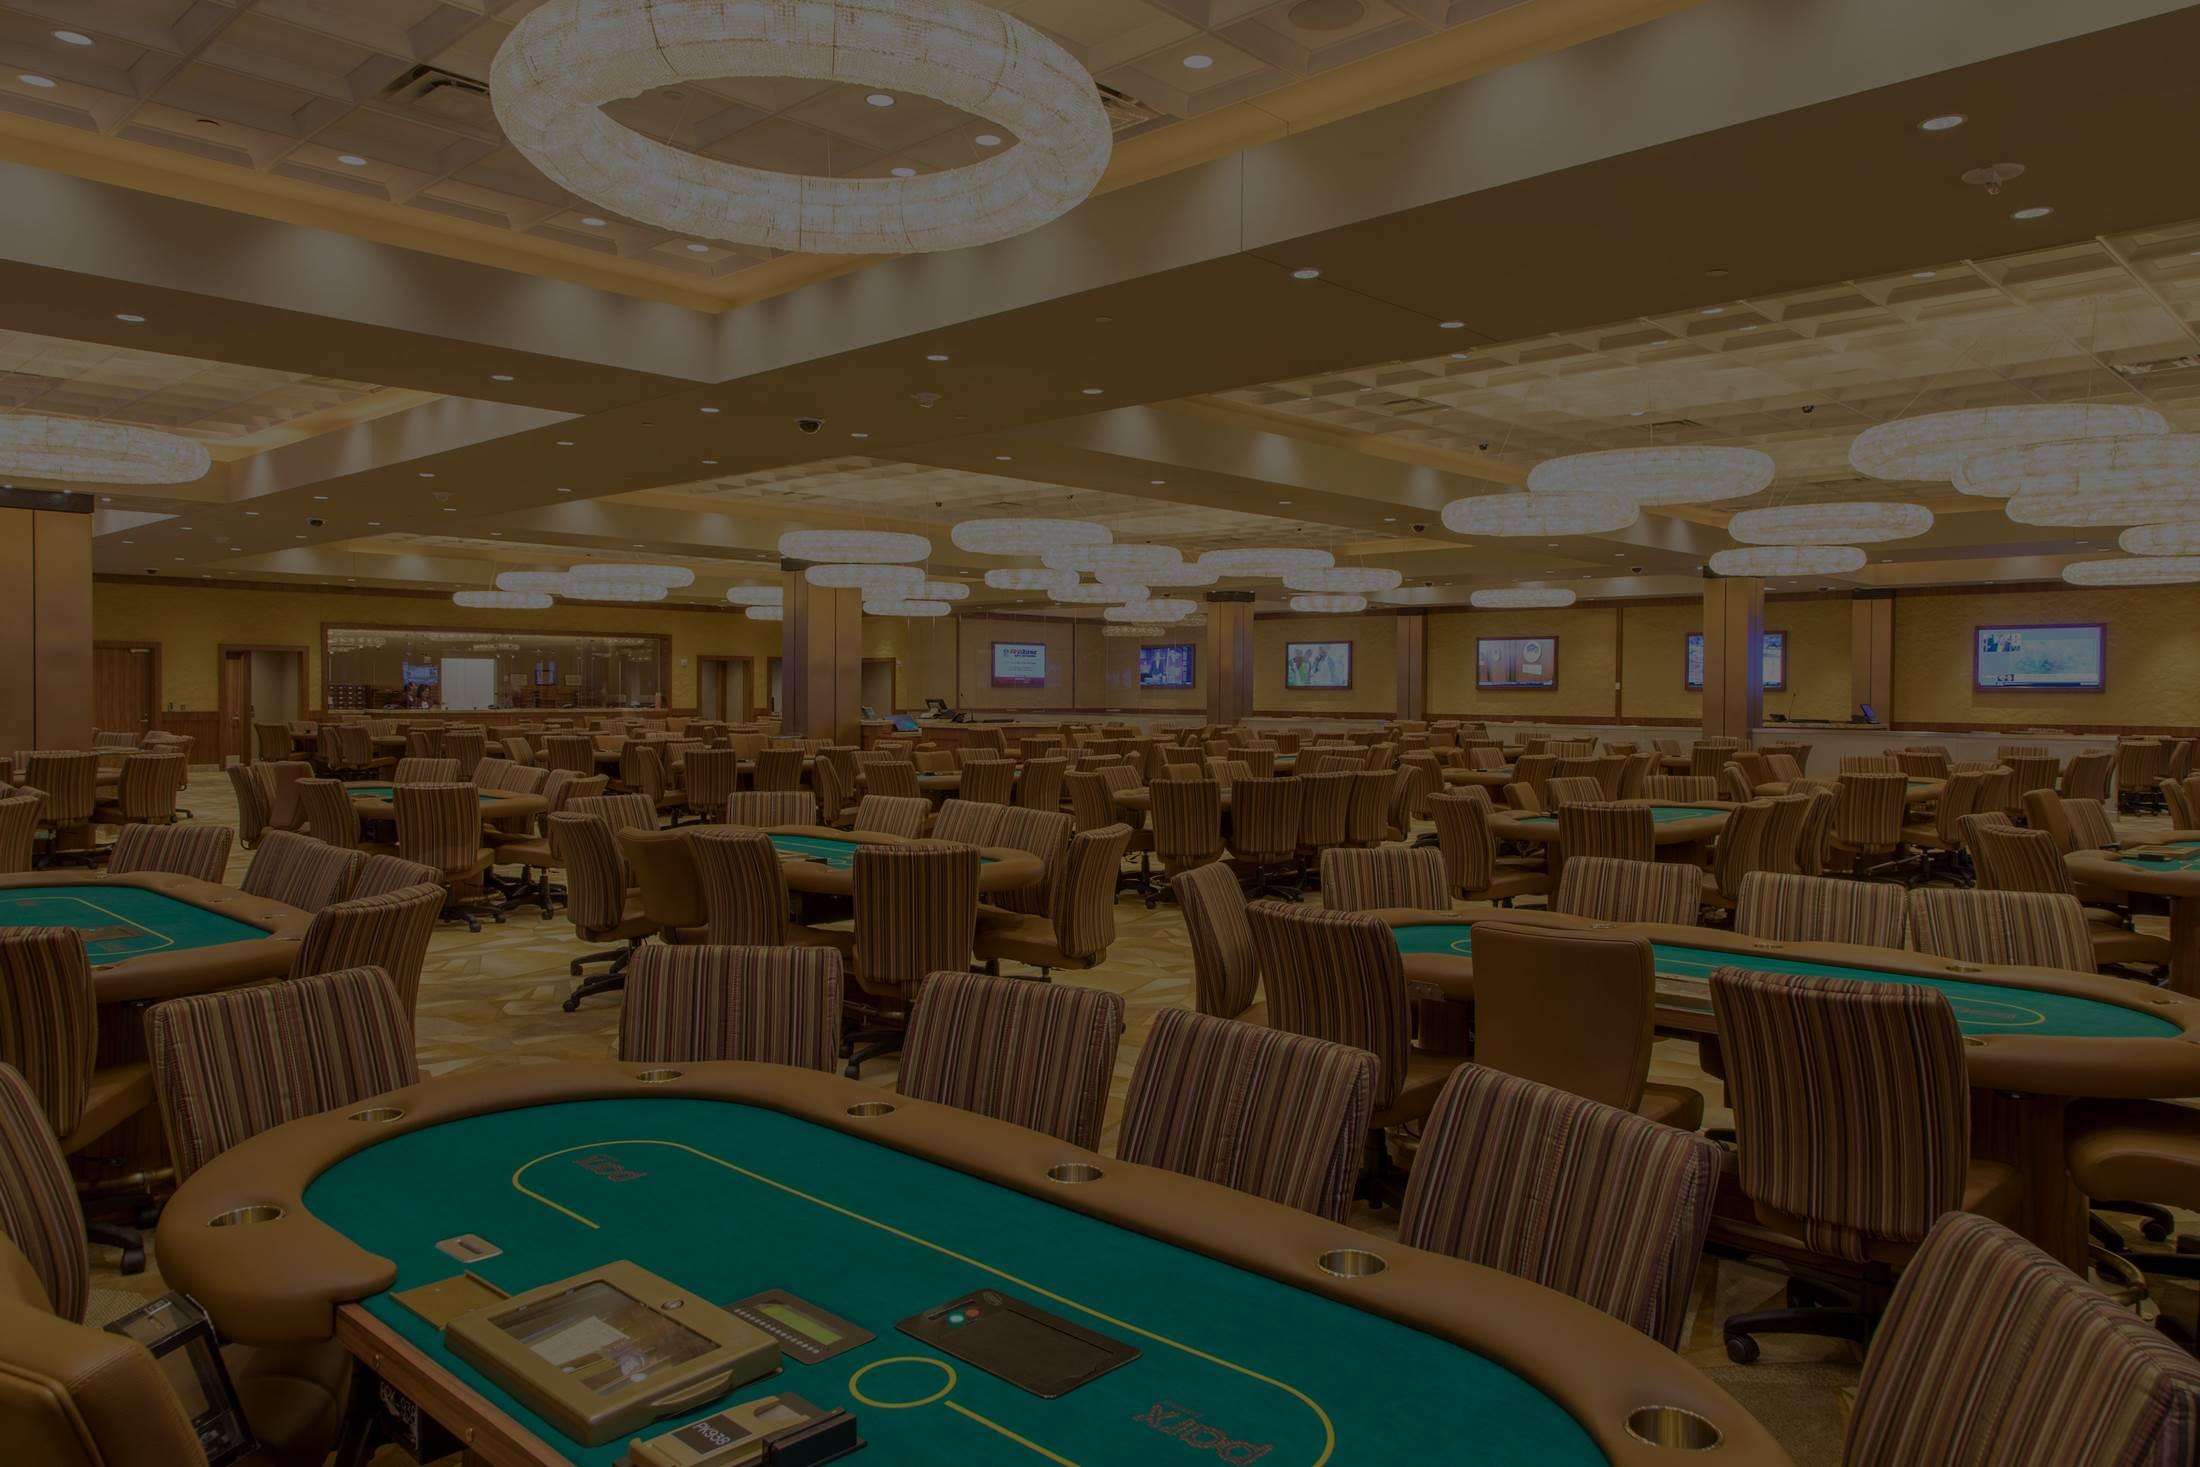 daftar poker online judi terpercaya